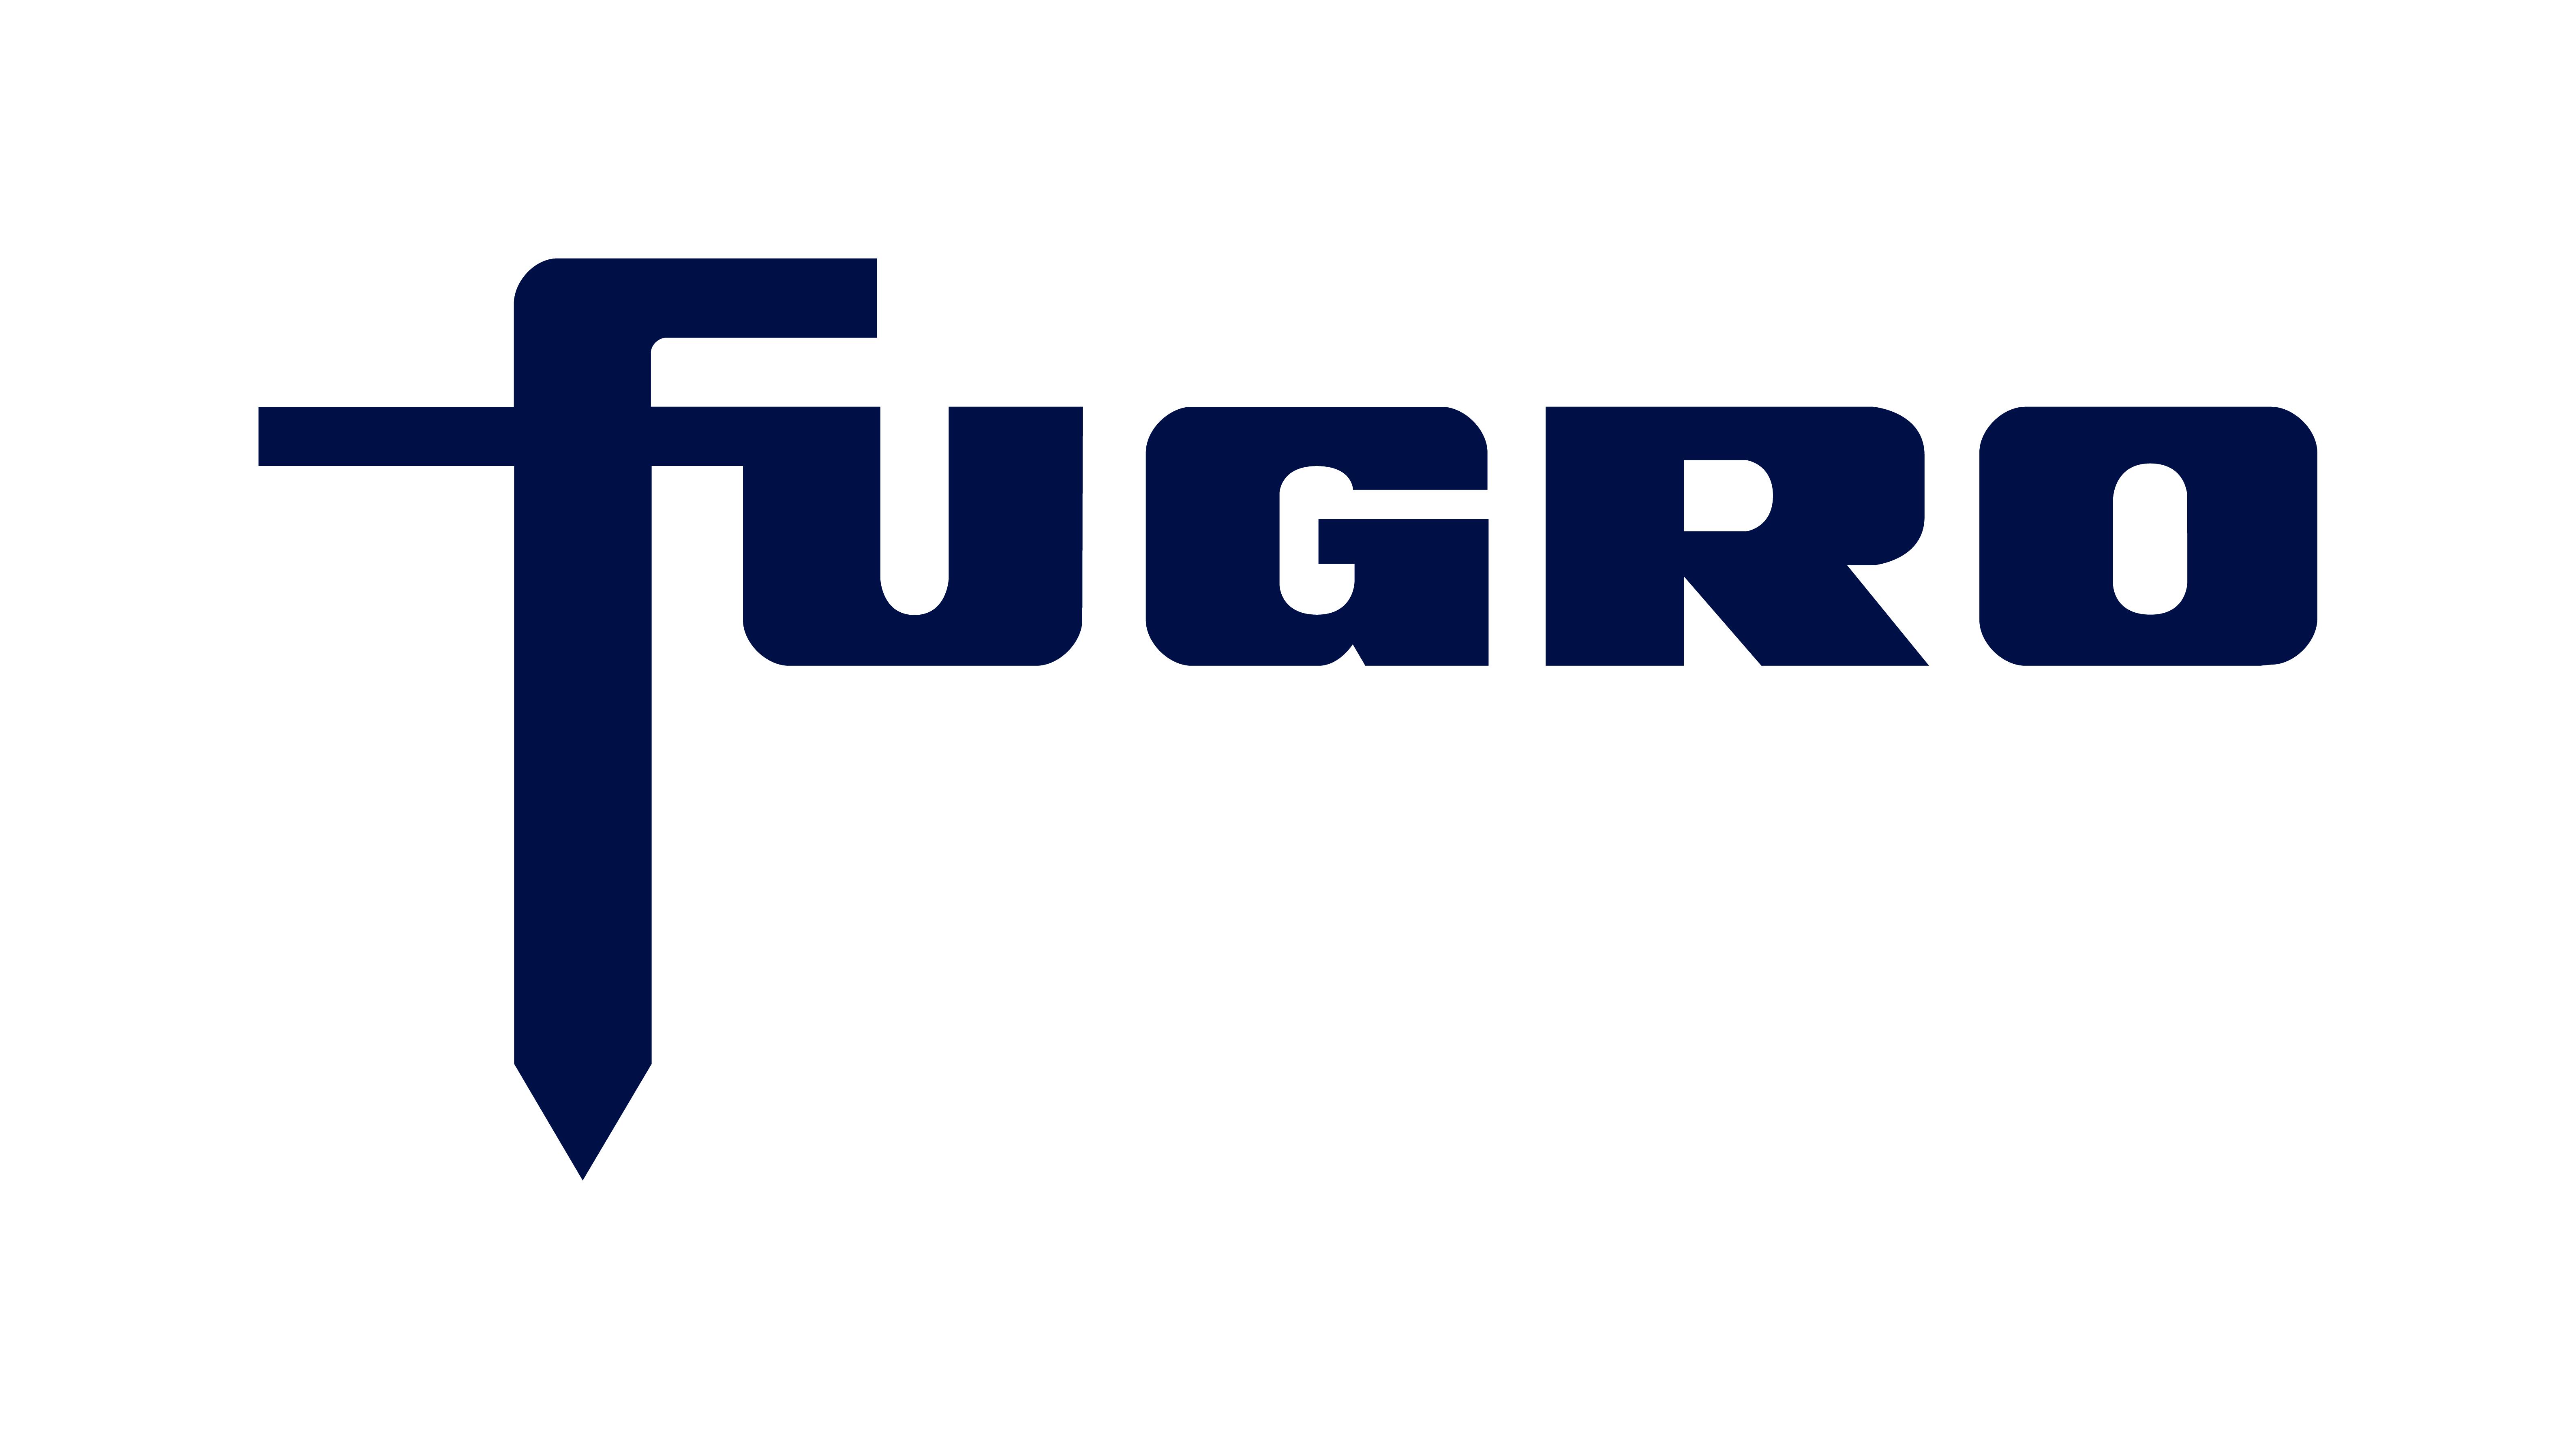 Fugro - Wikipedia